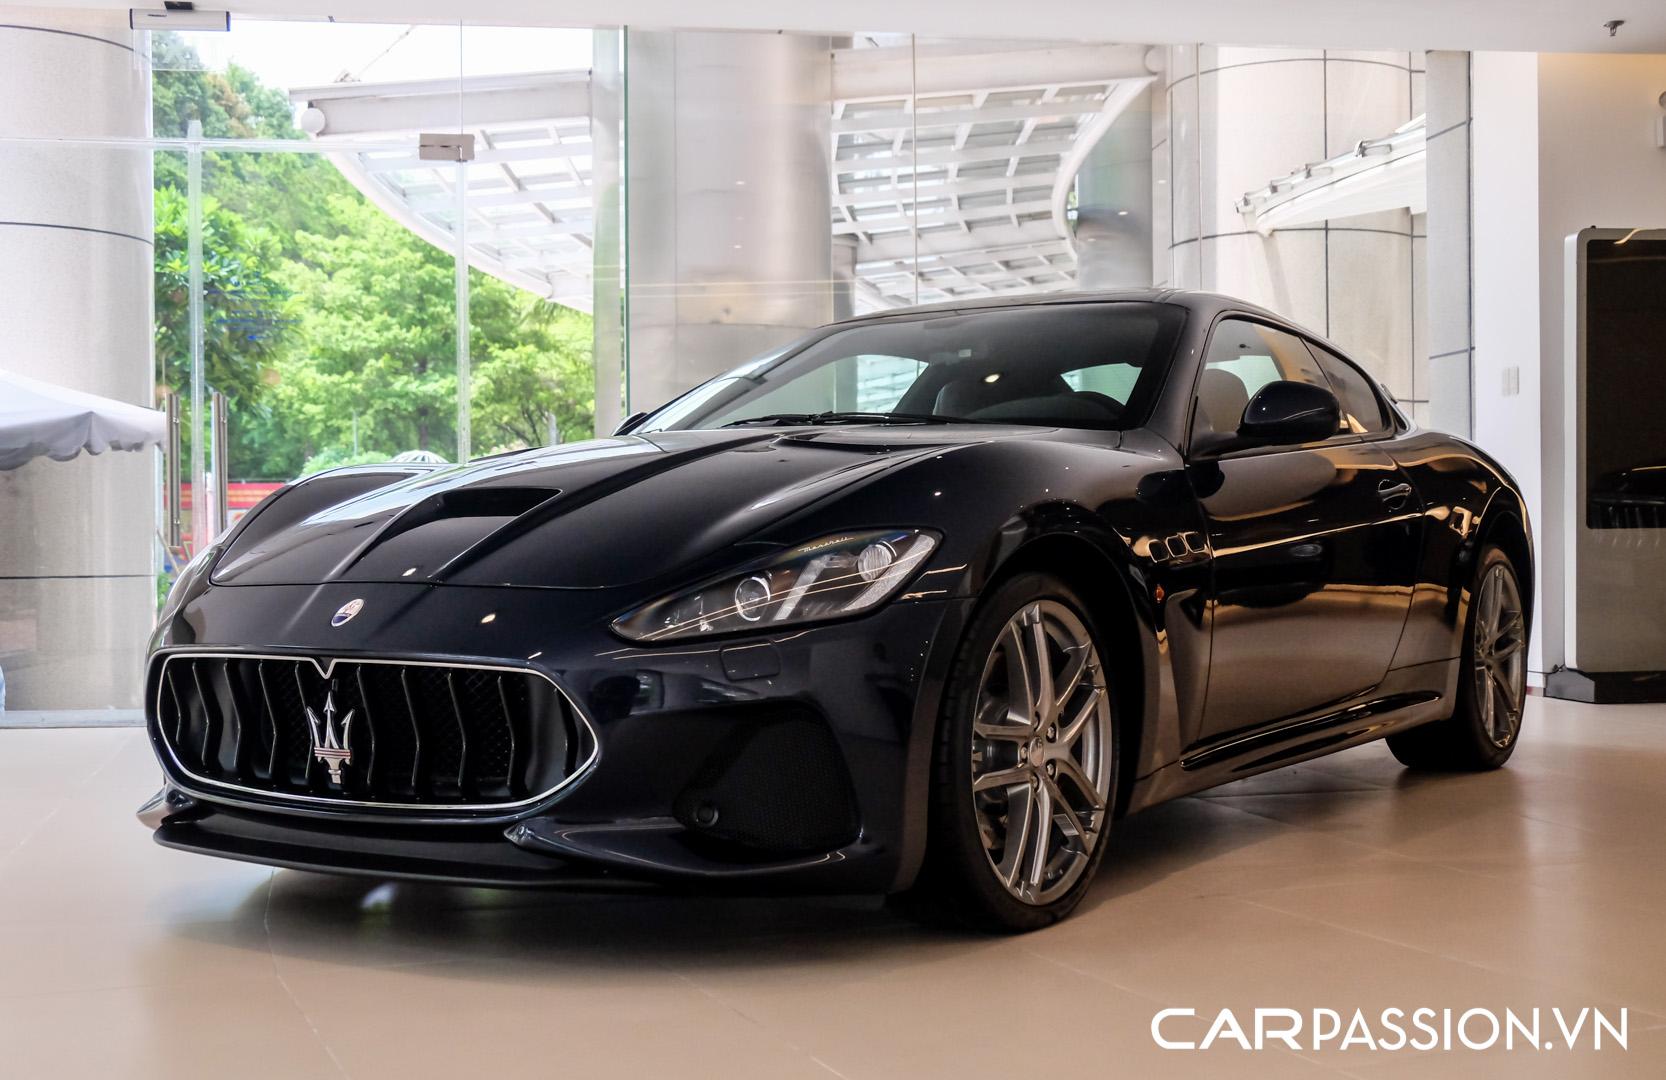 CP- Maserati GranTurismo Sport facelift5.JPG